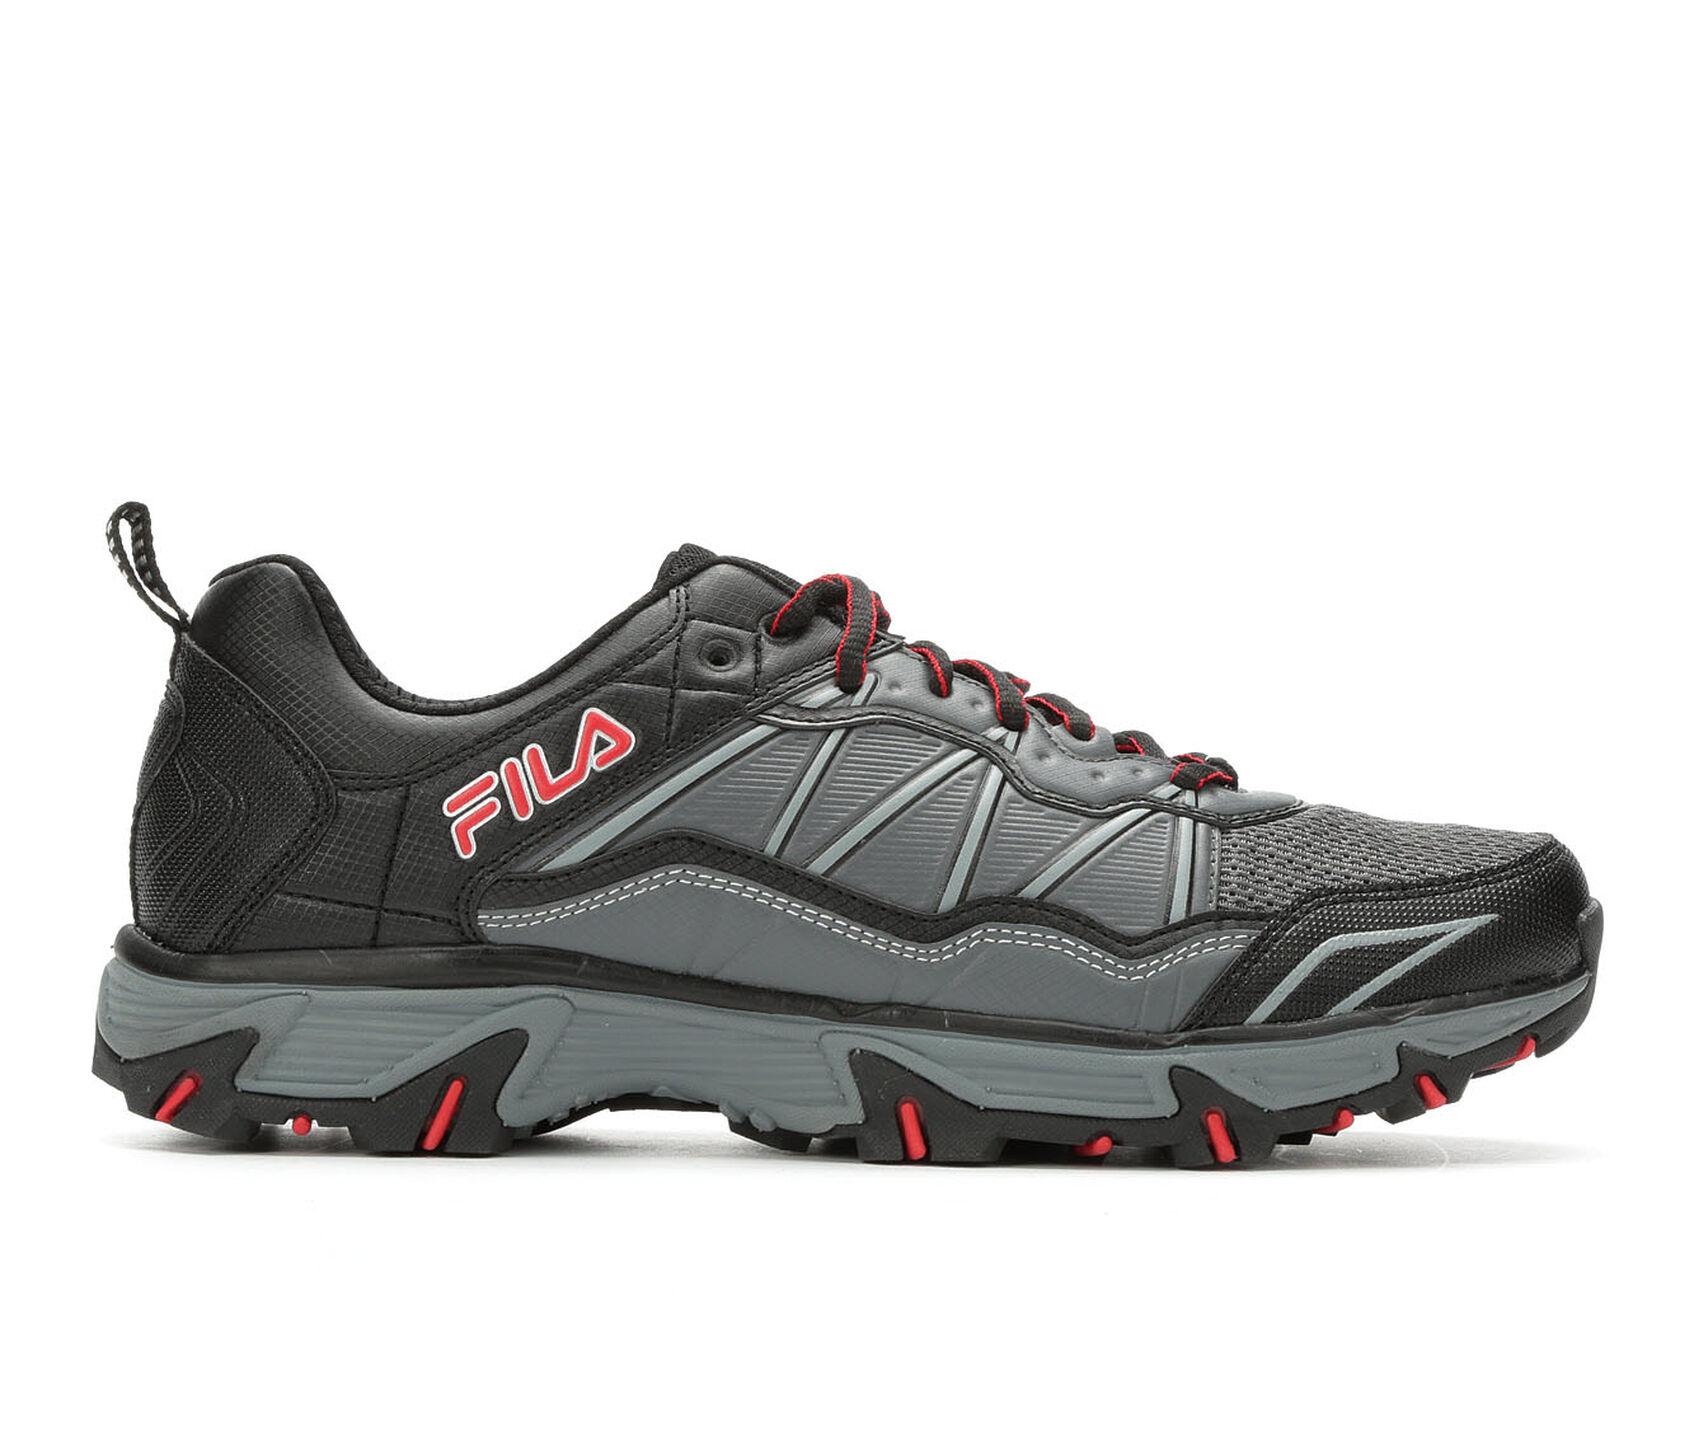 379d4507ee657c Images. Men  39 s Fila AT Peake 19 Trail Running Shoes